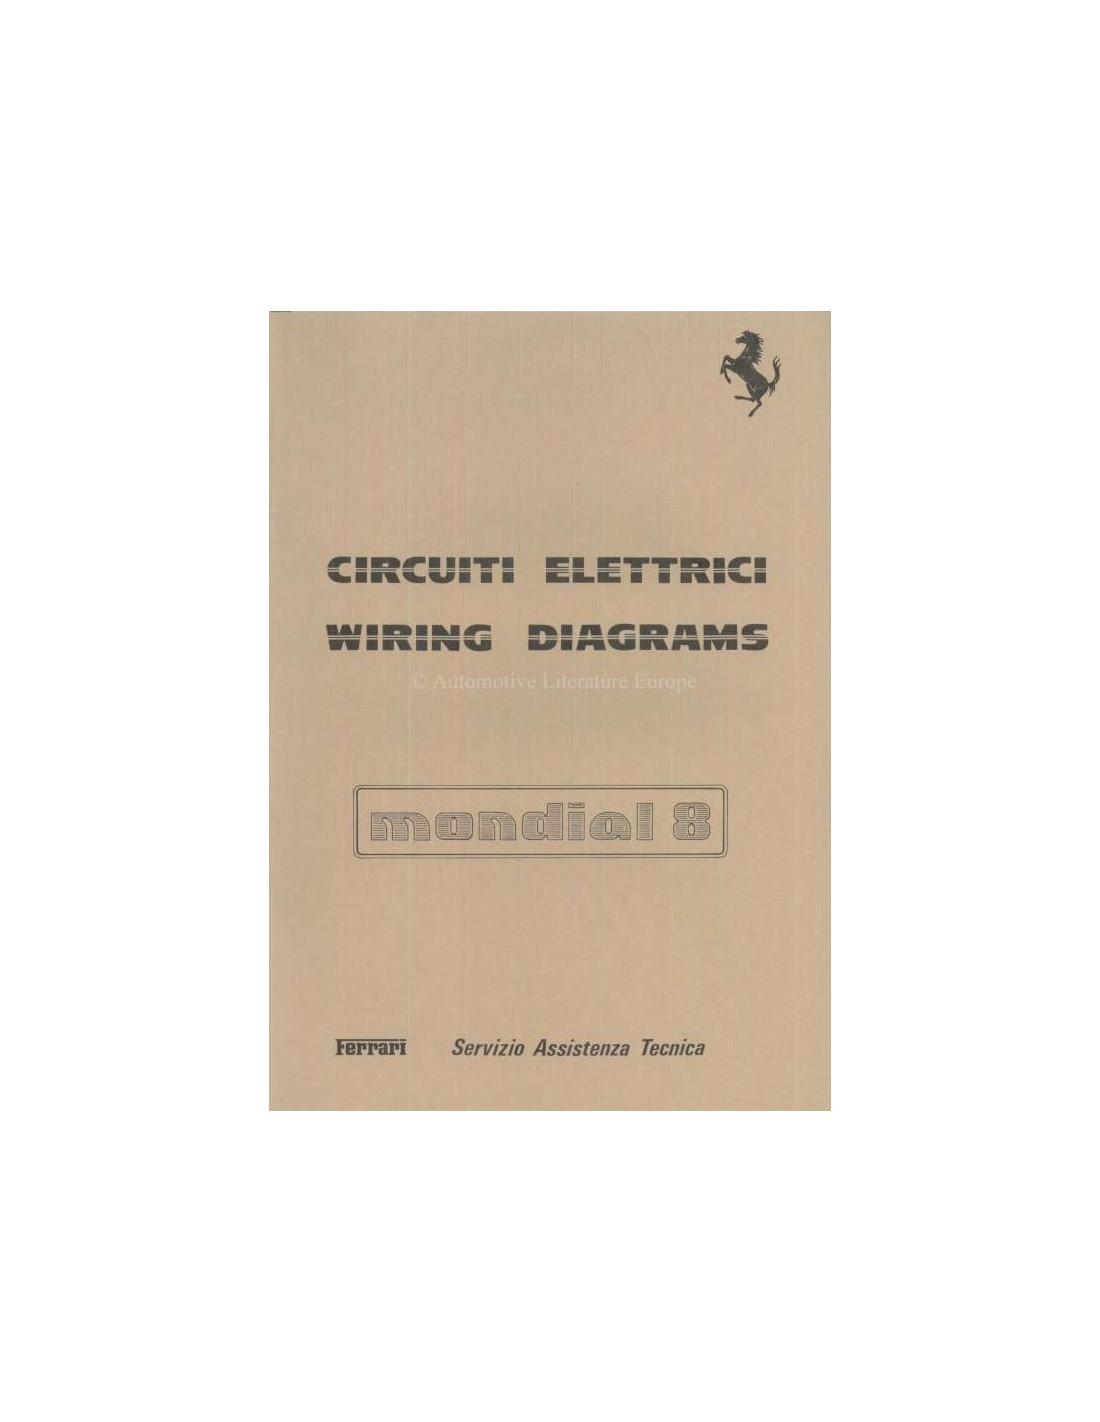 ferrari 328 wiring diagram ferrari 308 gts wiring diagram